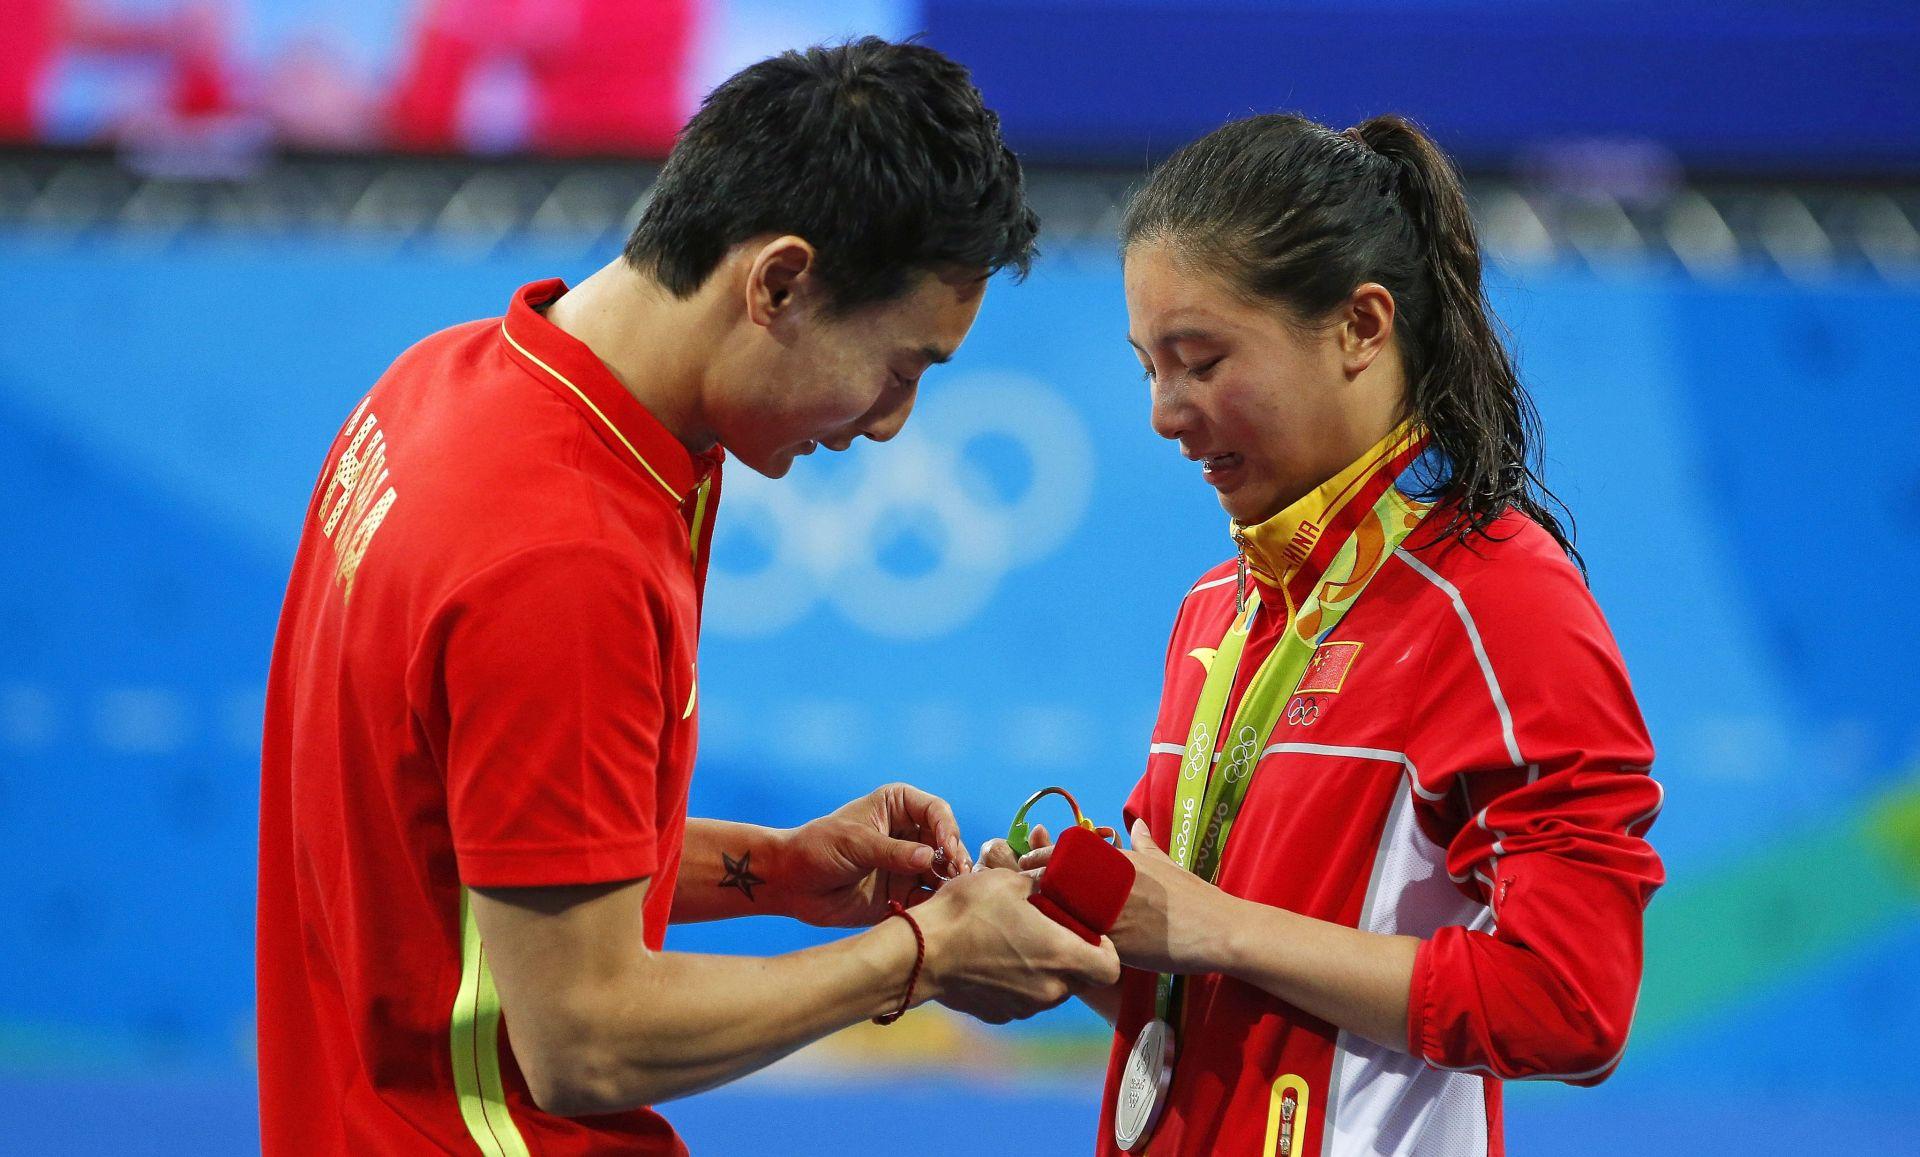 VIDEO: ROMANTIKA U RIJU Kineskinja osvojila srebrnu medalju, a potom dobila i zaručnički prsten